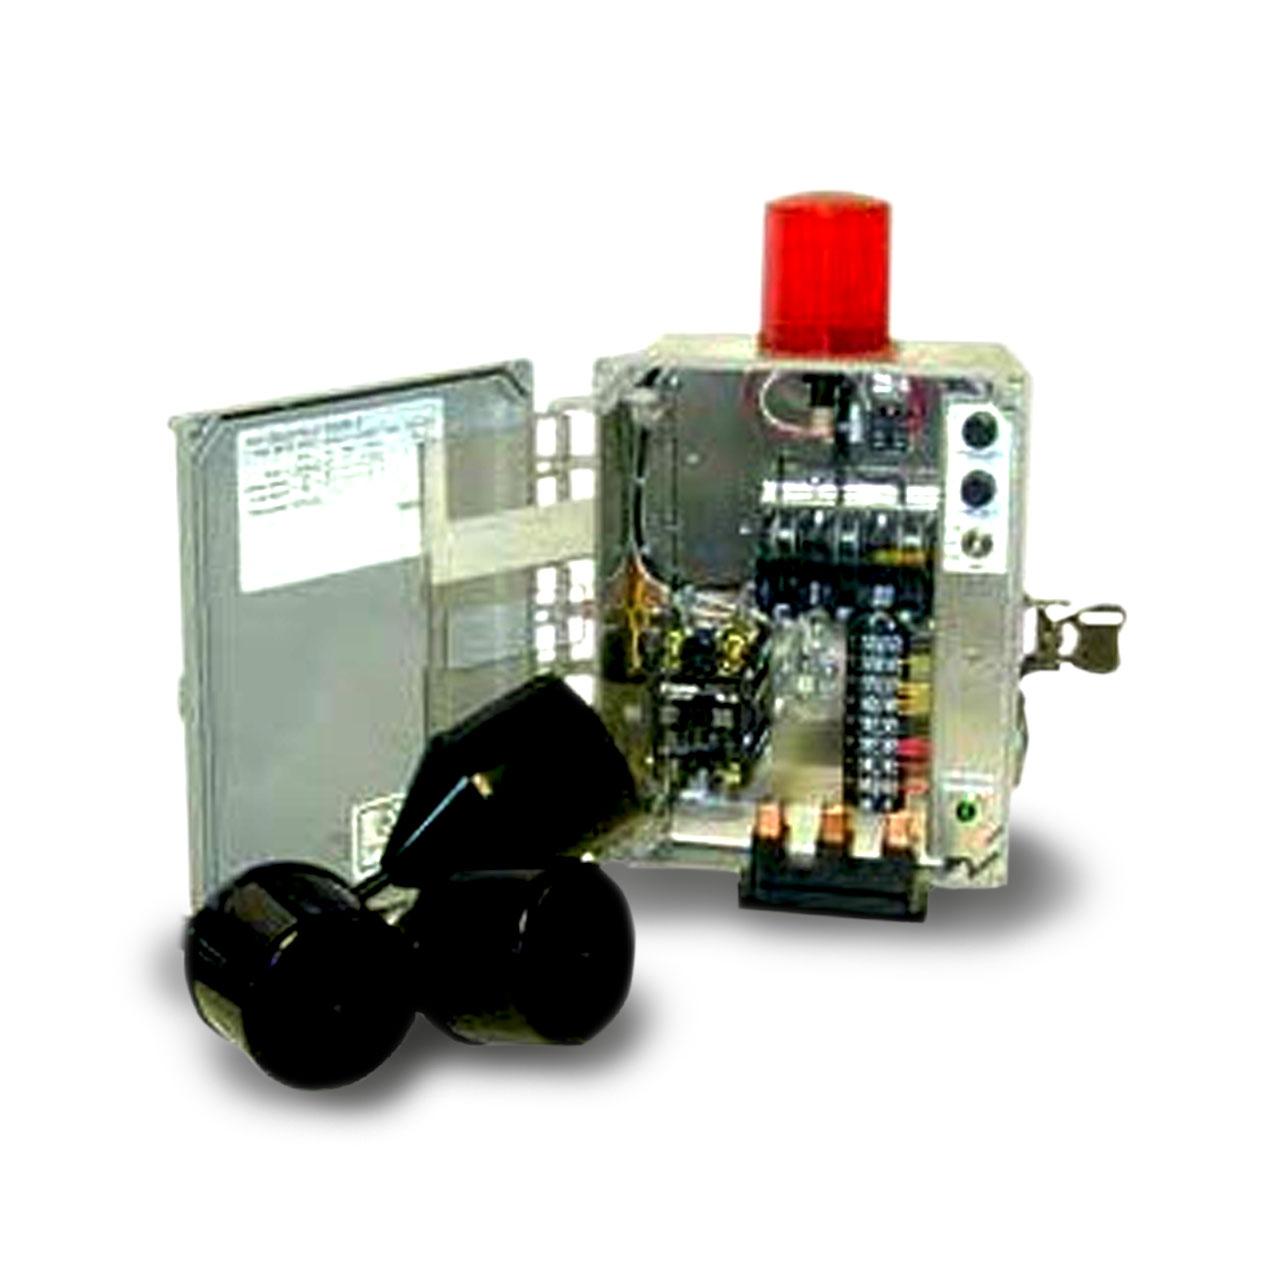 Zoeller Zoeller 10 2714 Intrinsically Safe Control Panel